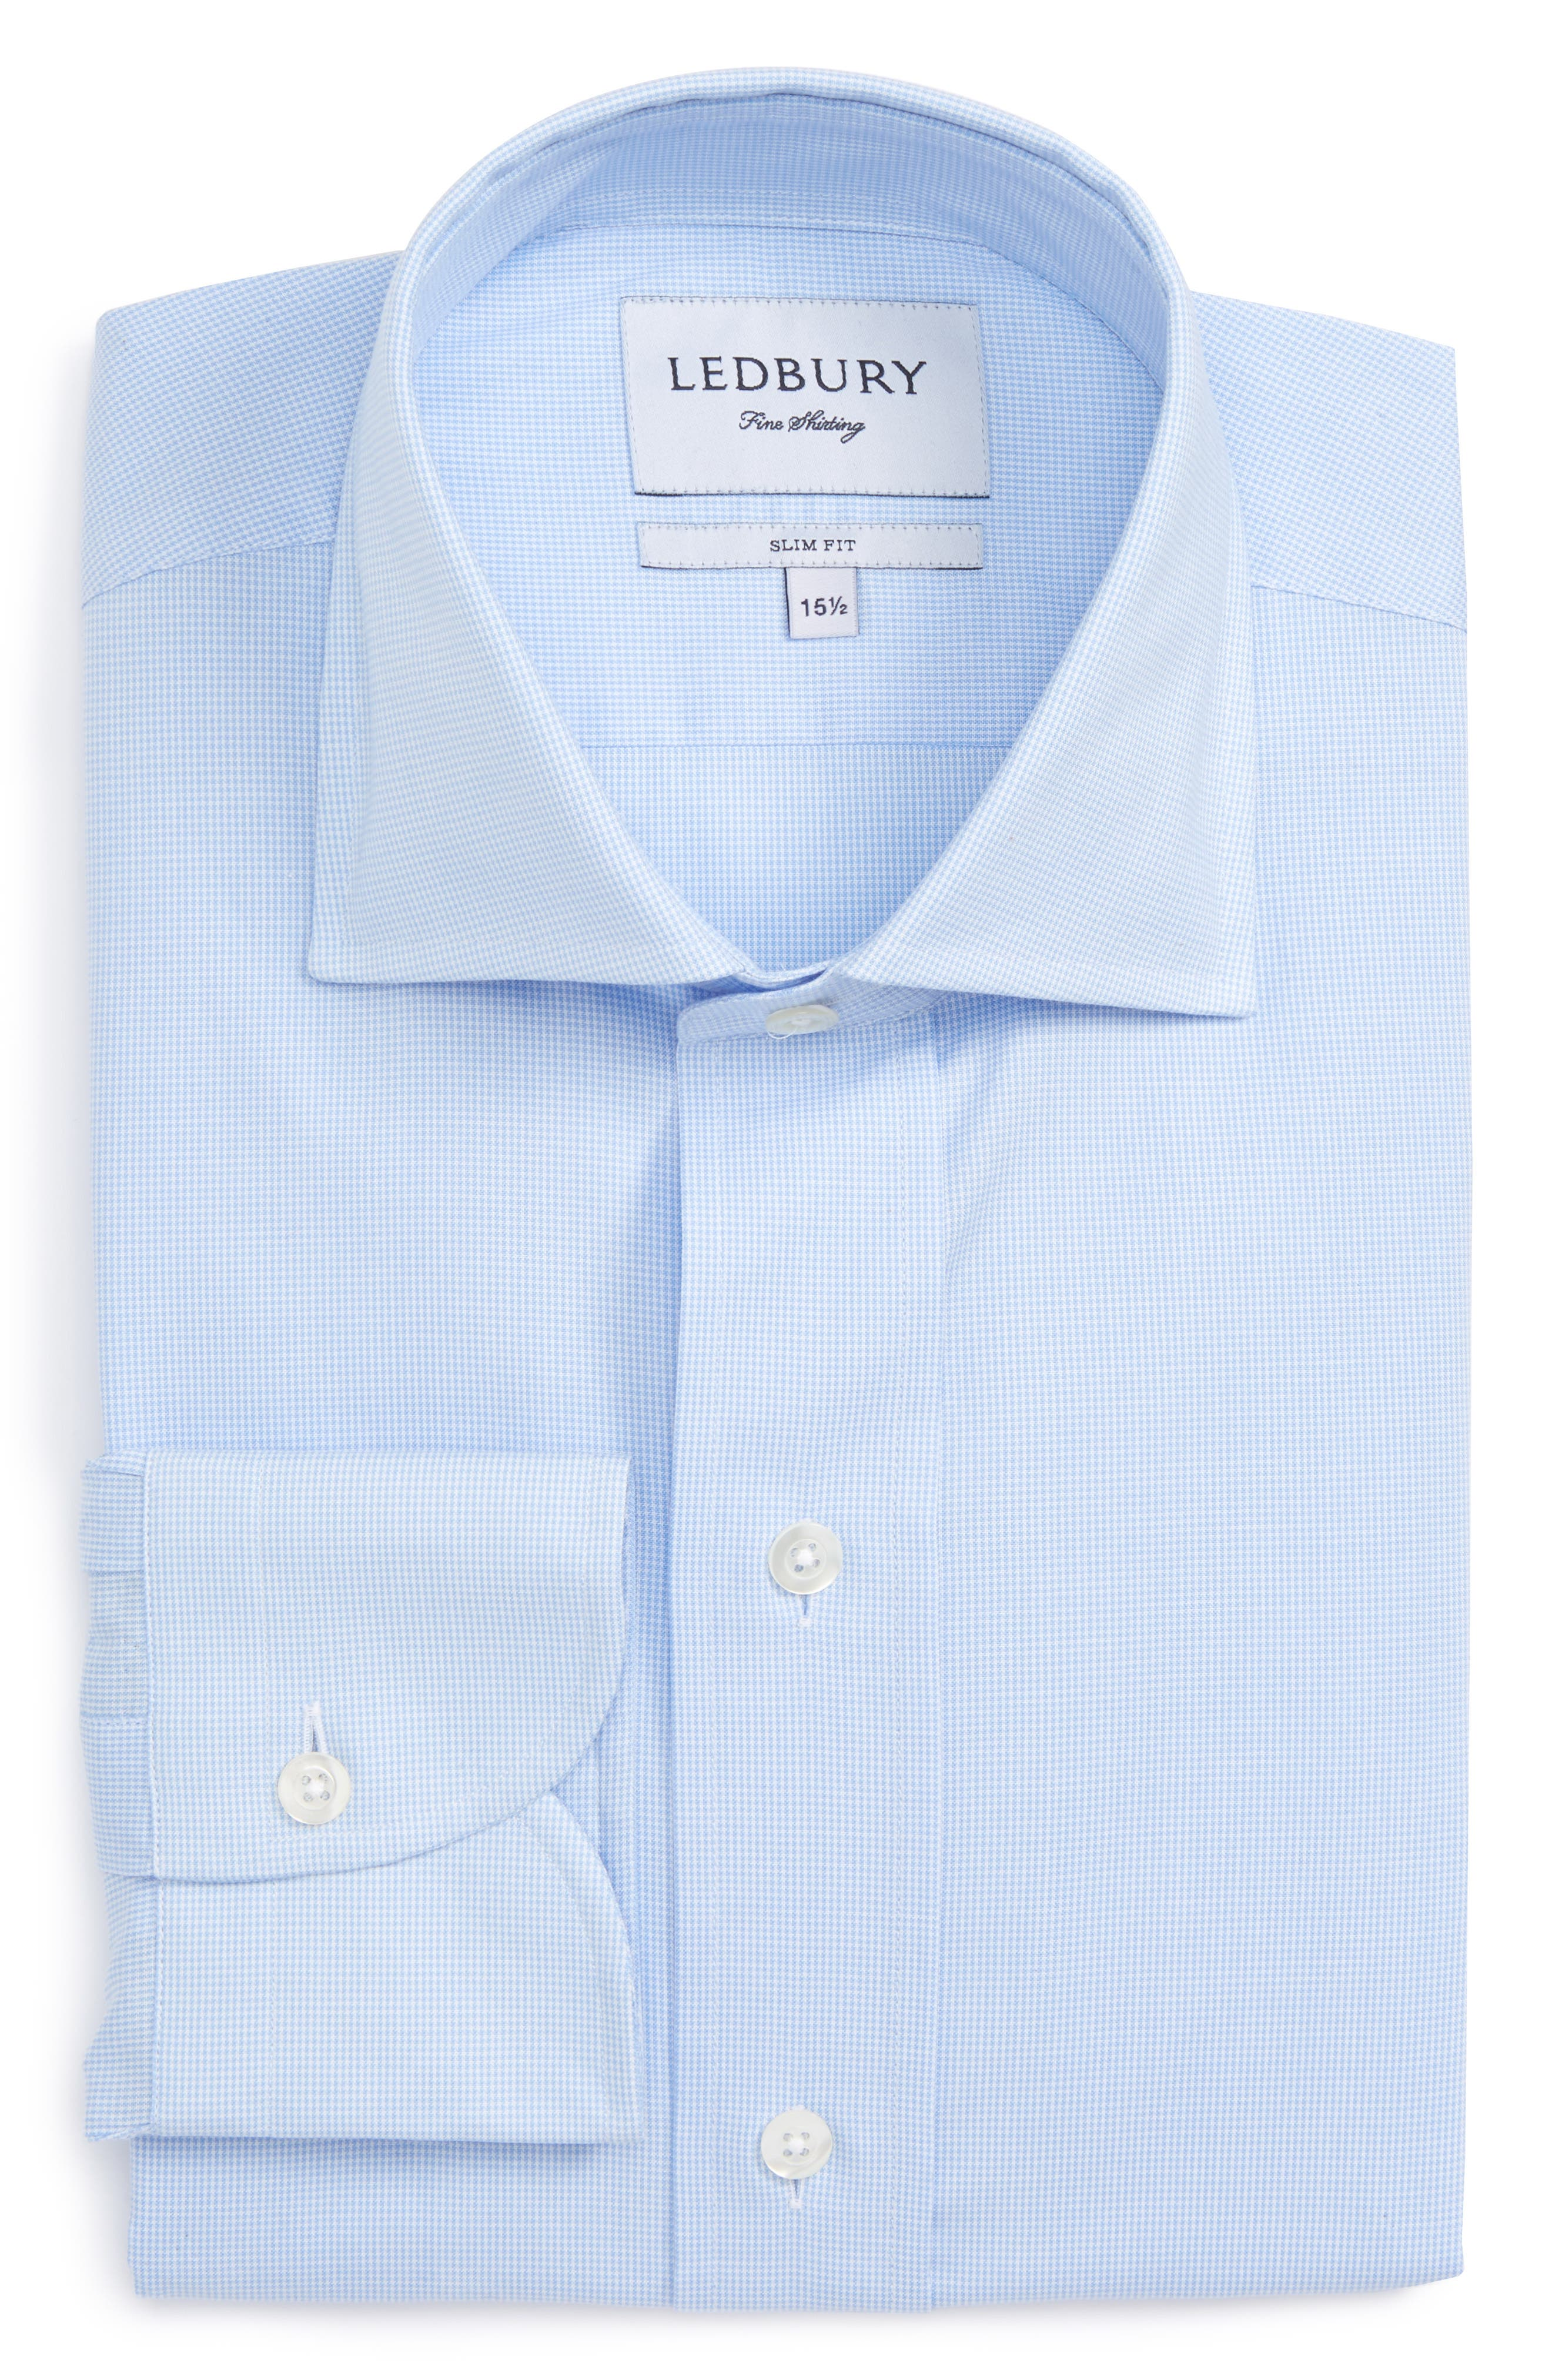 Ledbury Slim Fit Houndstooth Dress Shirt